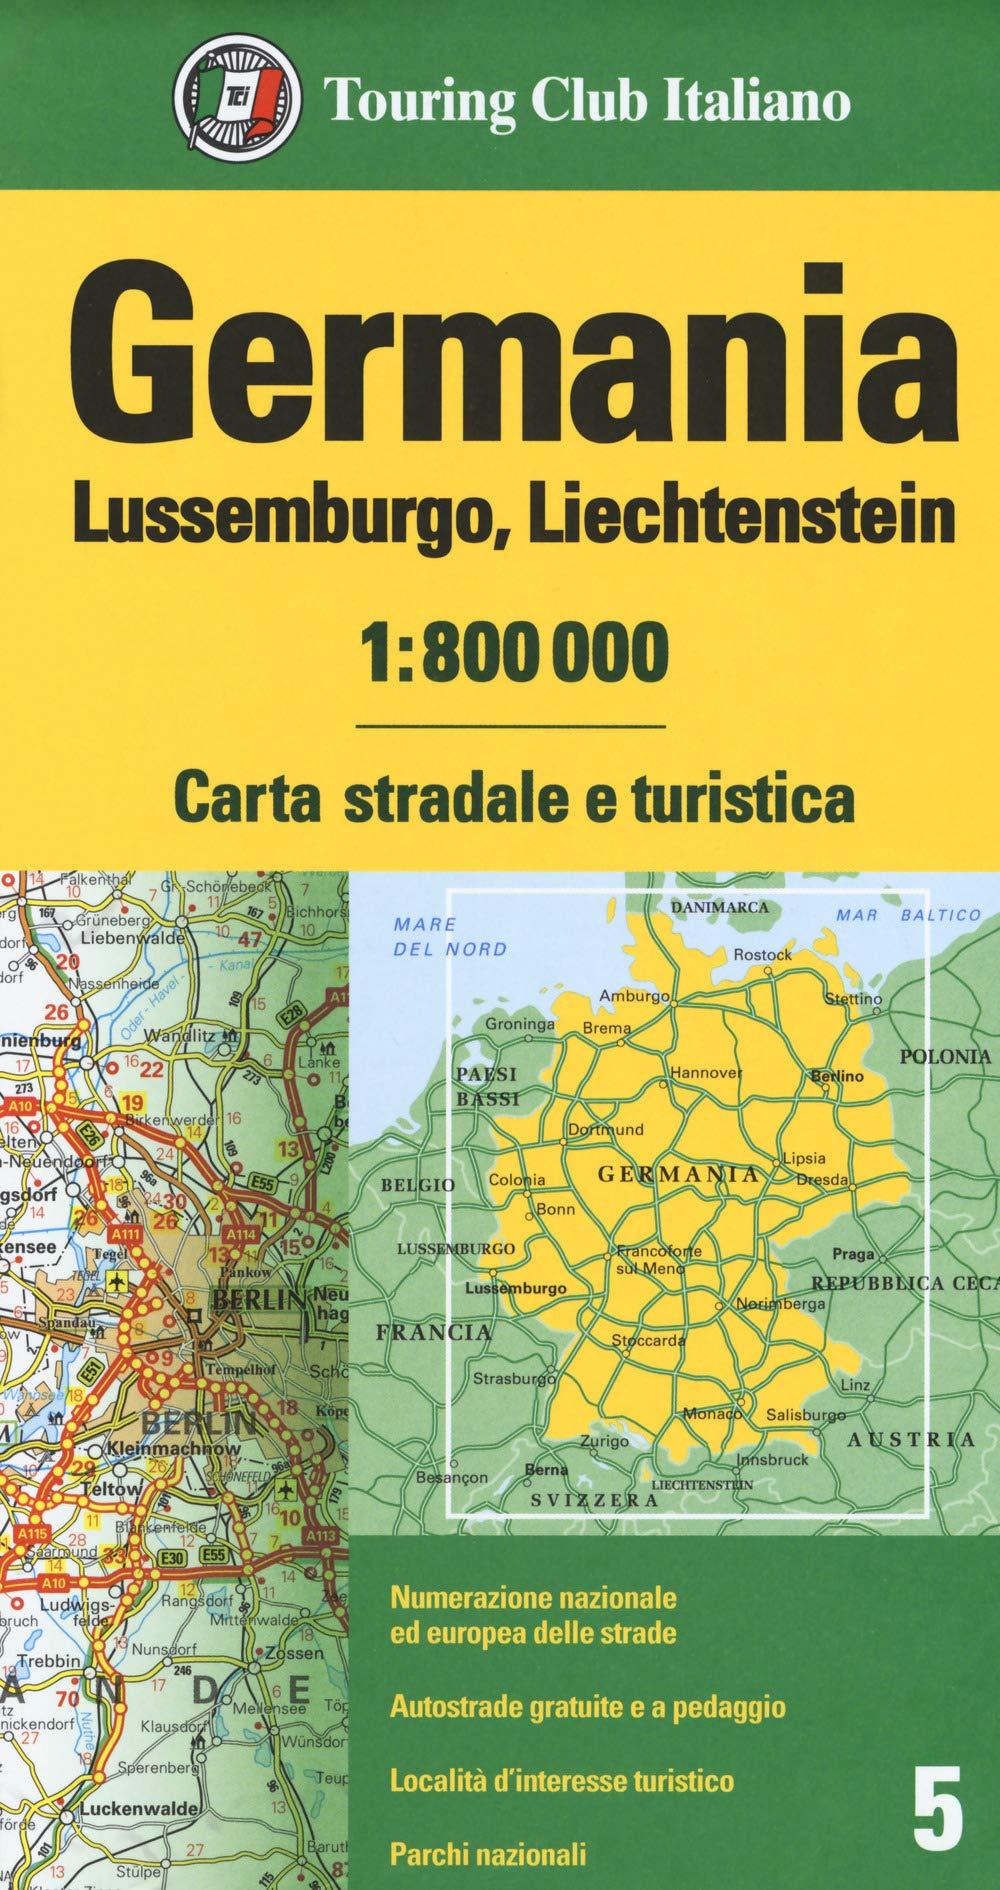 Dortmund Germania Cartina.Amazon It Germania Lussemburgo Liechtenstein 1 800 000 Carta Stradale E Turistica Libri